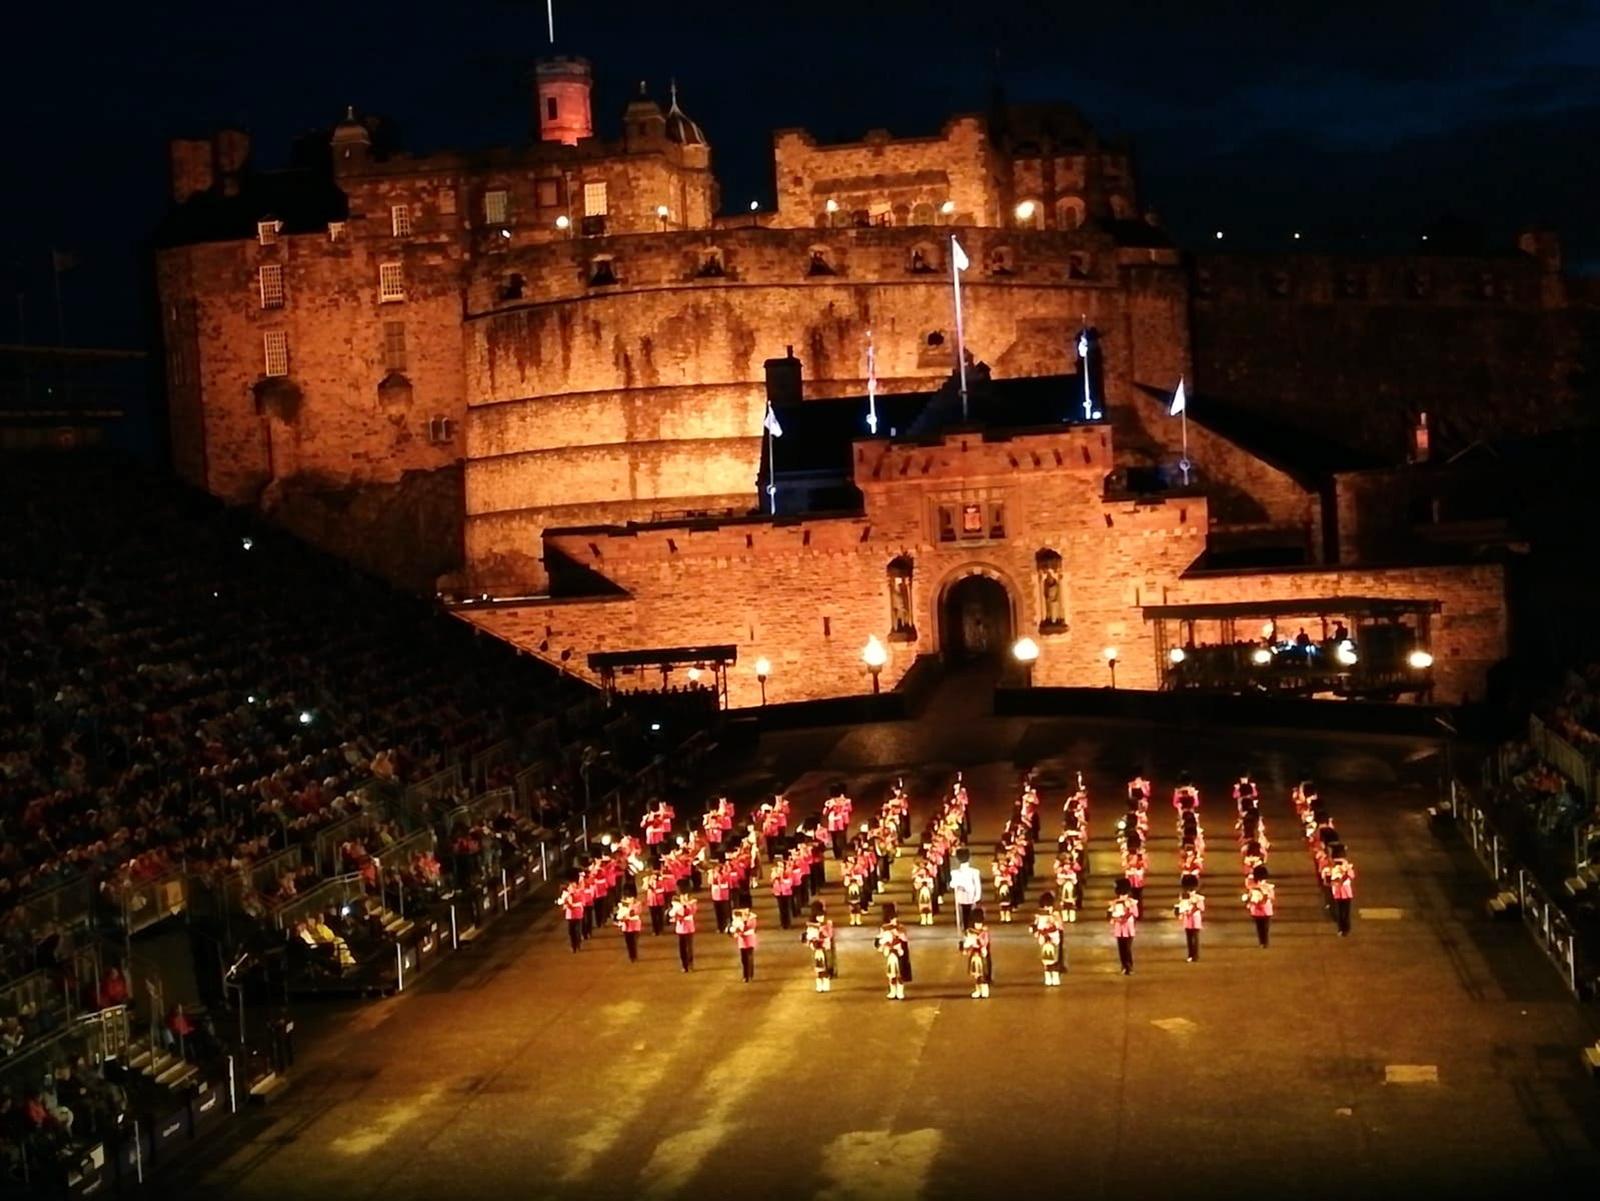 Zapovjednik ZzP-a na festivalu vojnih orkestara u Edinburghu